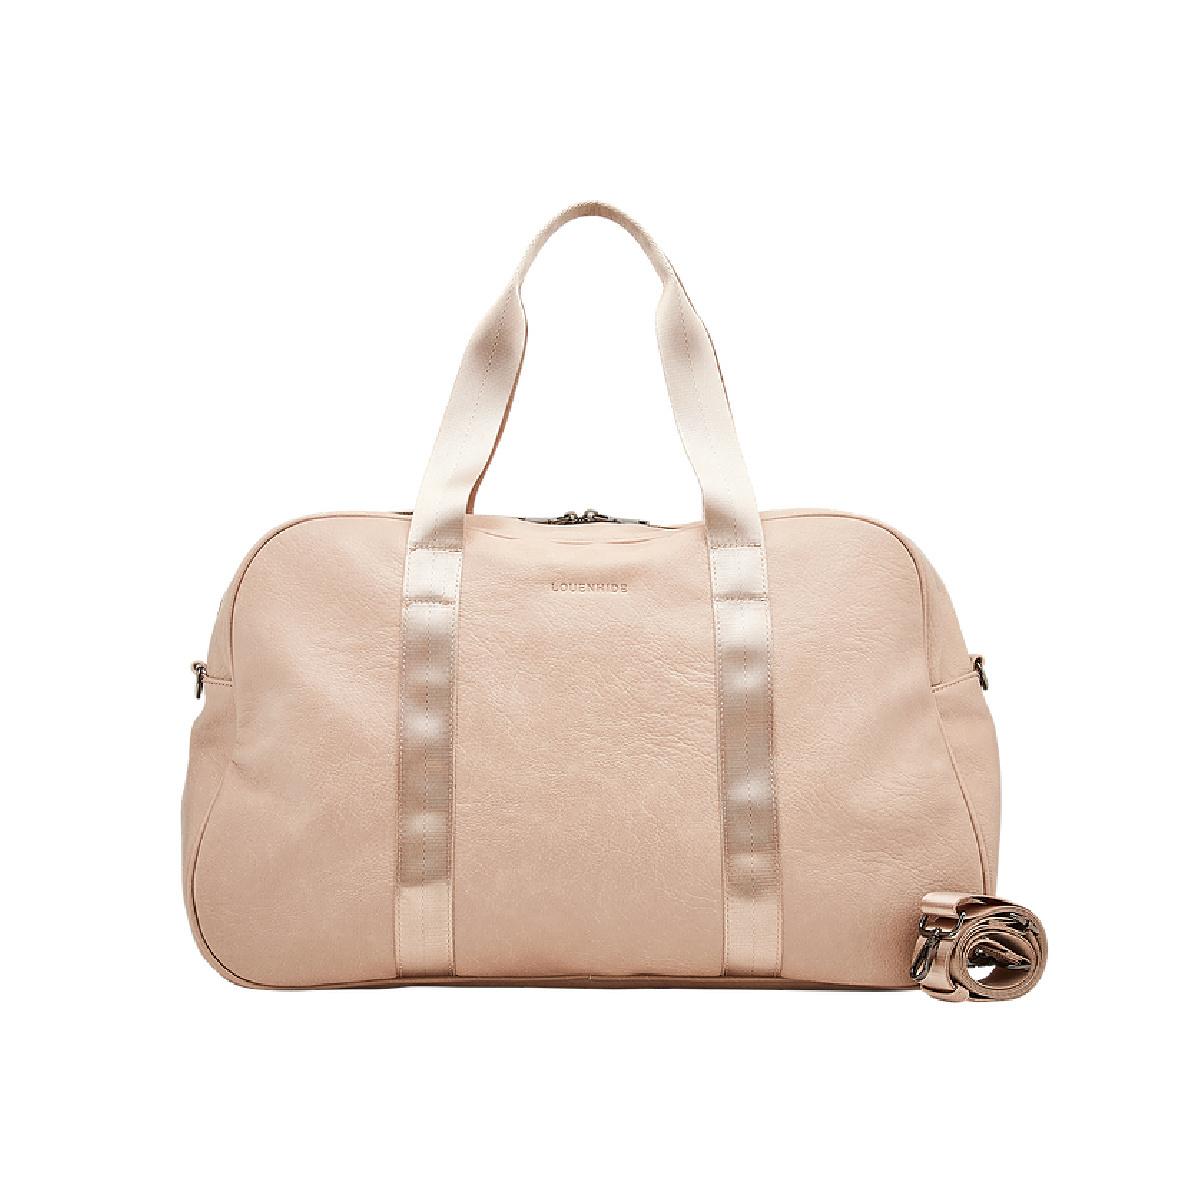 Louenhide Brighton Gym Bag  Bag